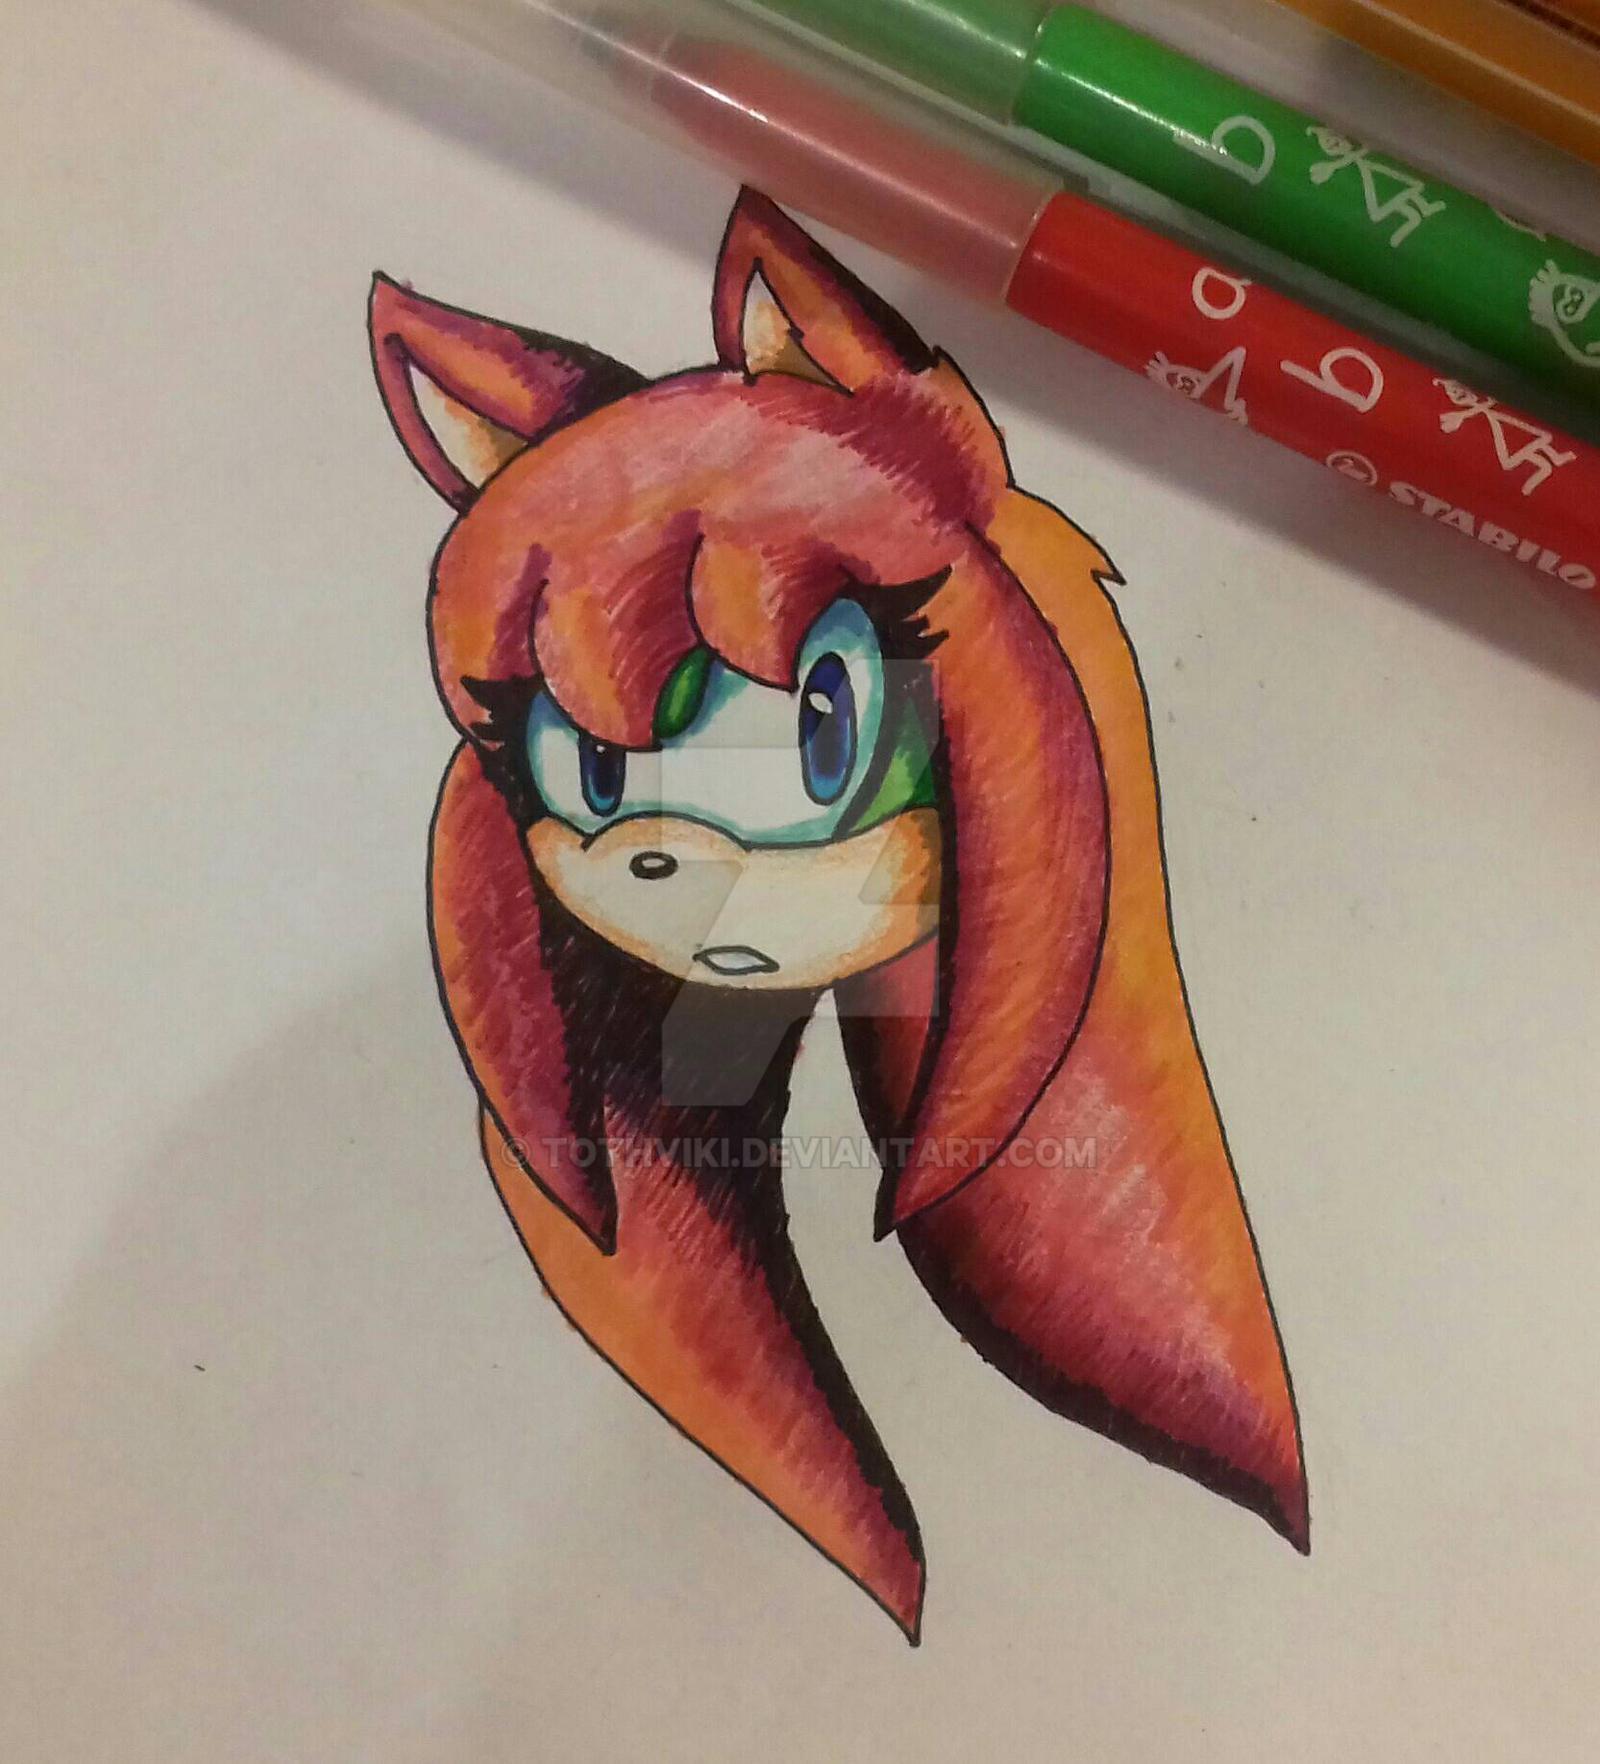 Viki (felt pen drawing) by TothViki